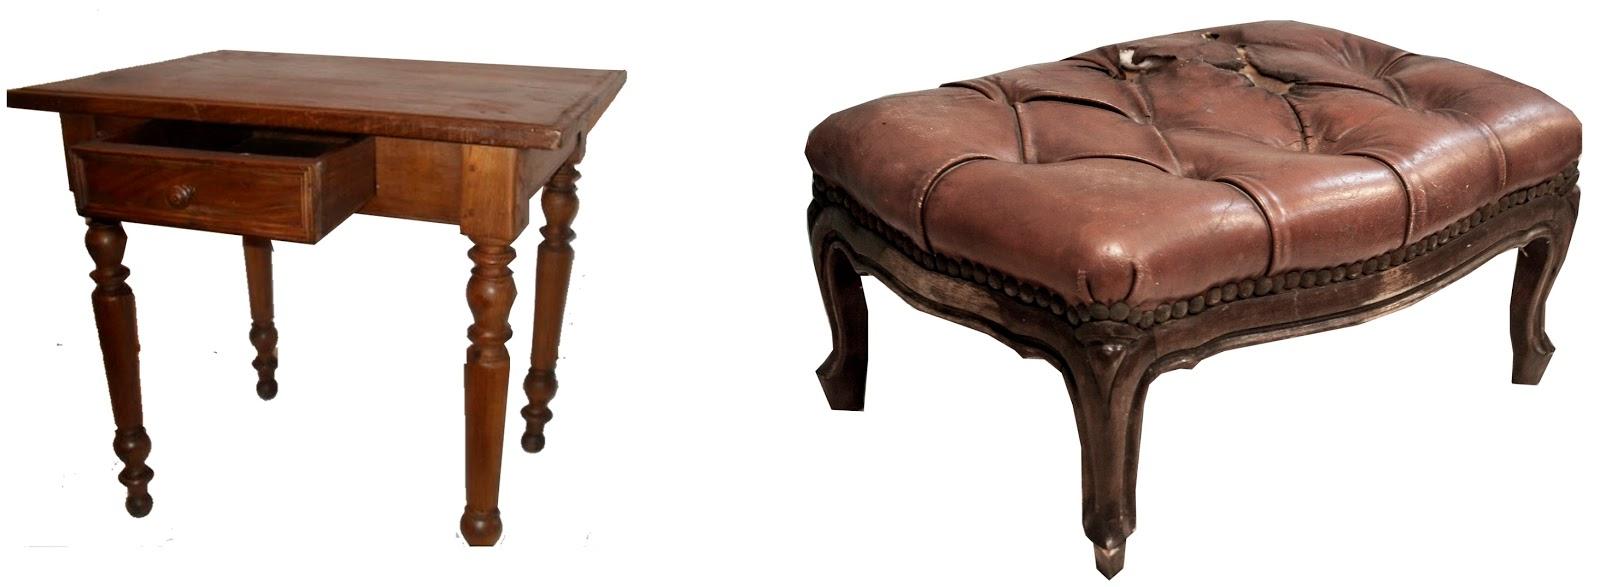 Se Compran Muebles Usados Ipdd Espacio Baramo Tips Para Prar Muebles Usados